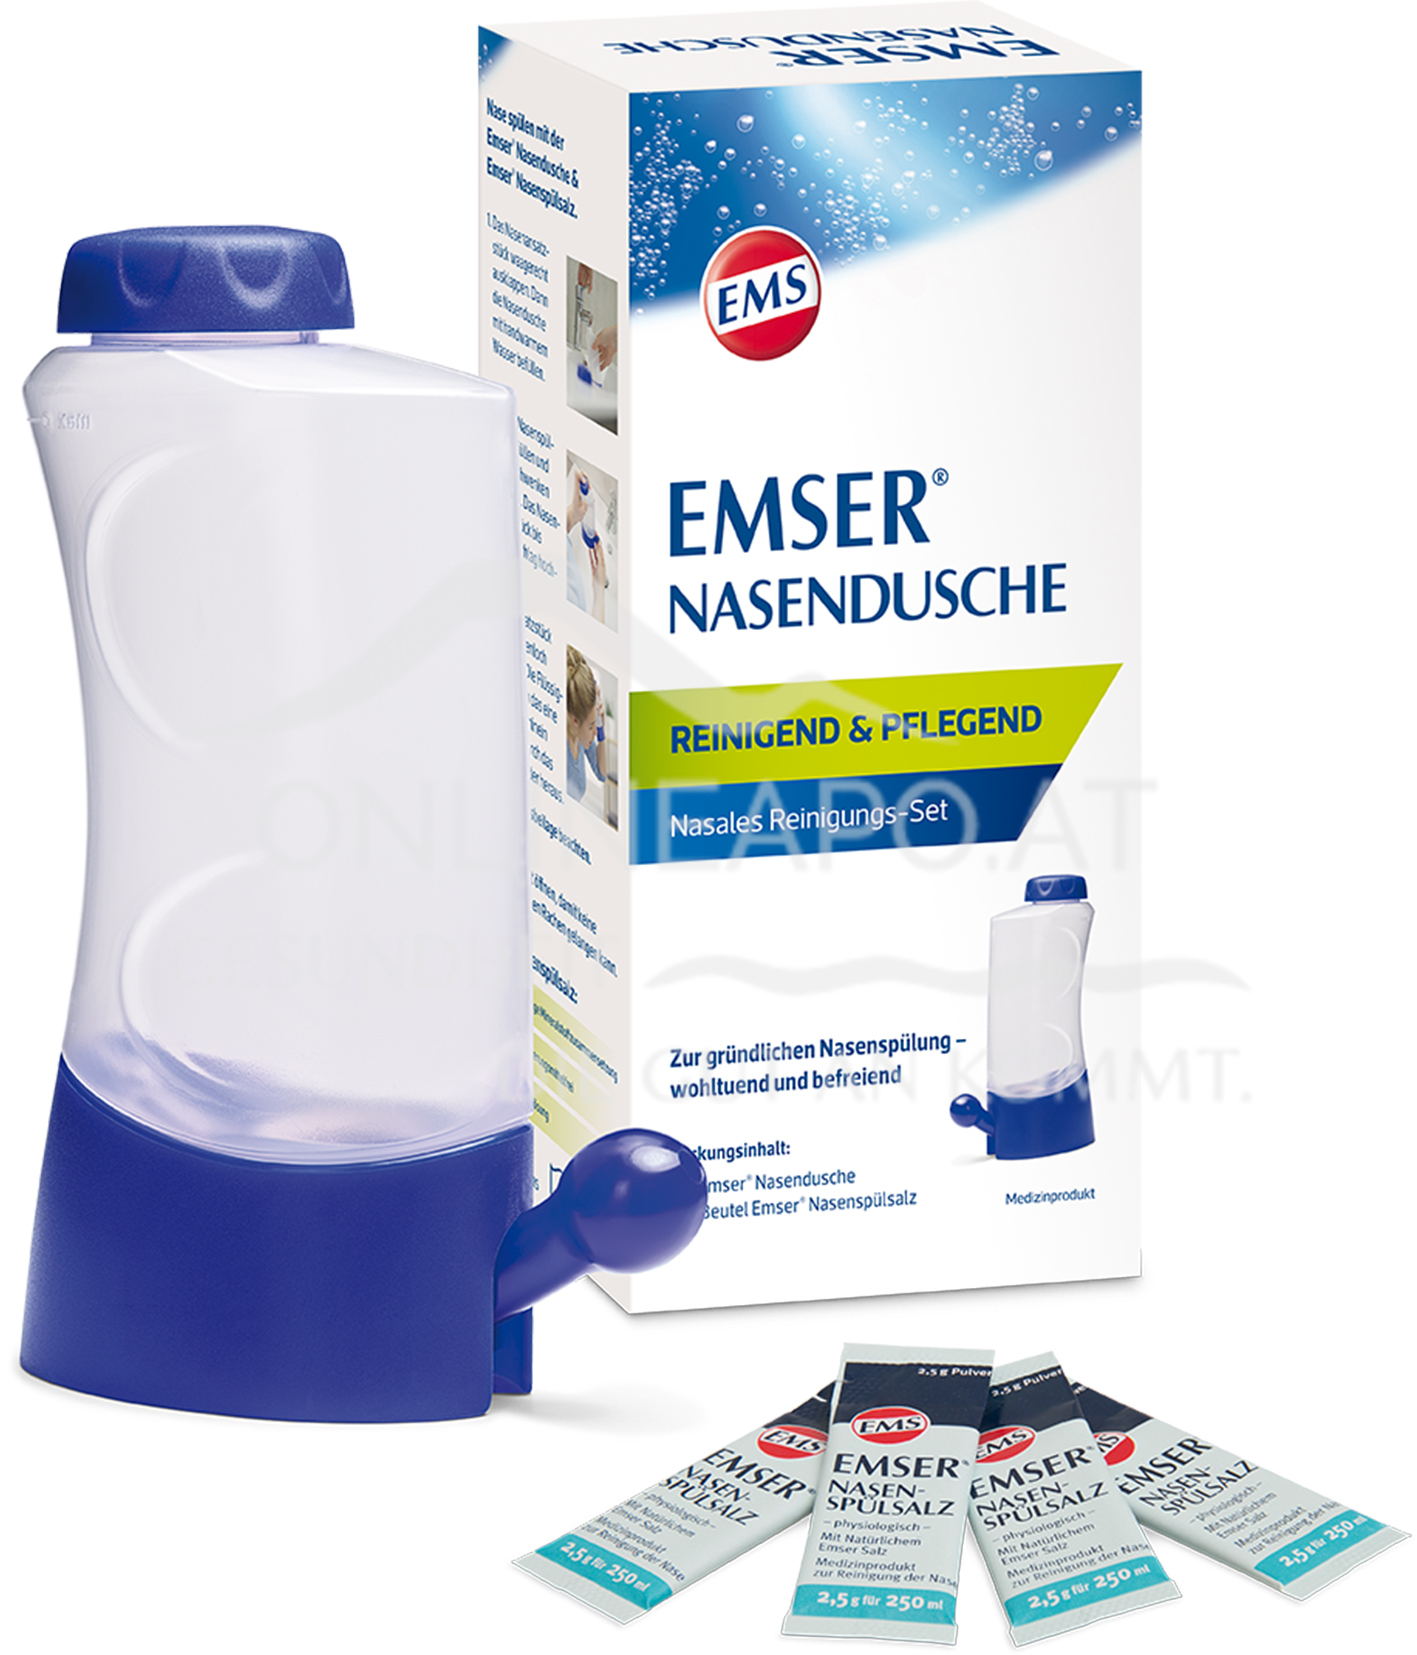 Emser® Nasendusche inkl. Nasenspülsalz 2,5g